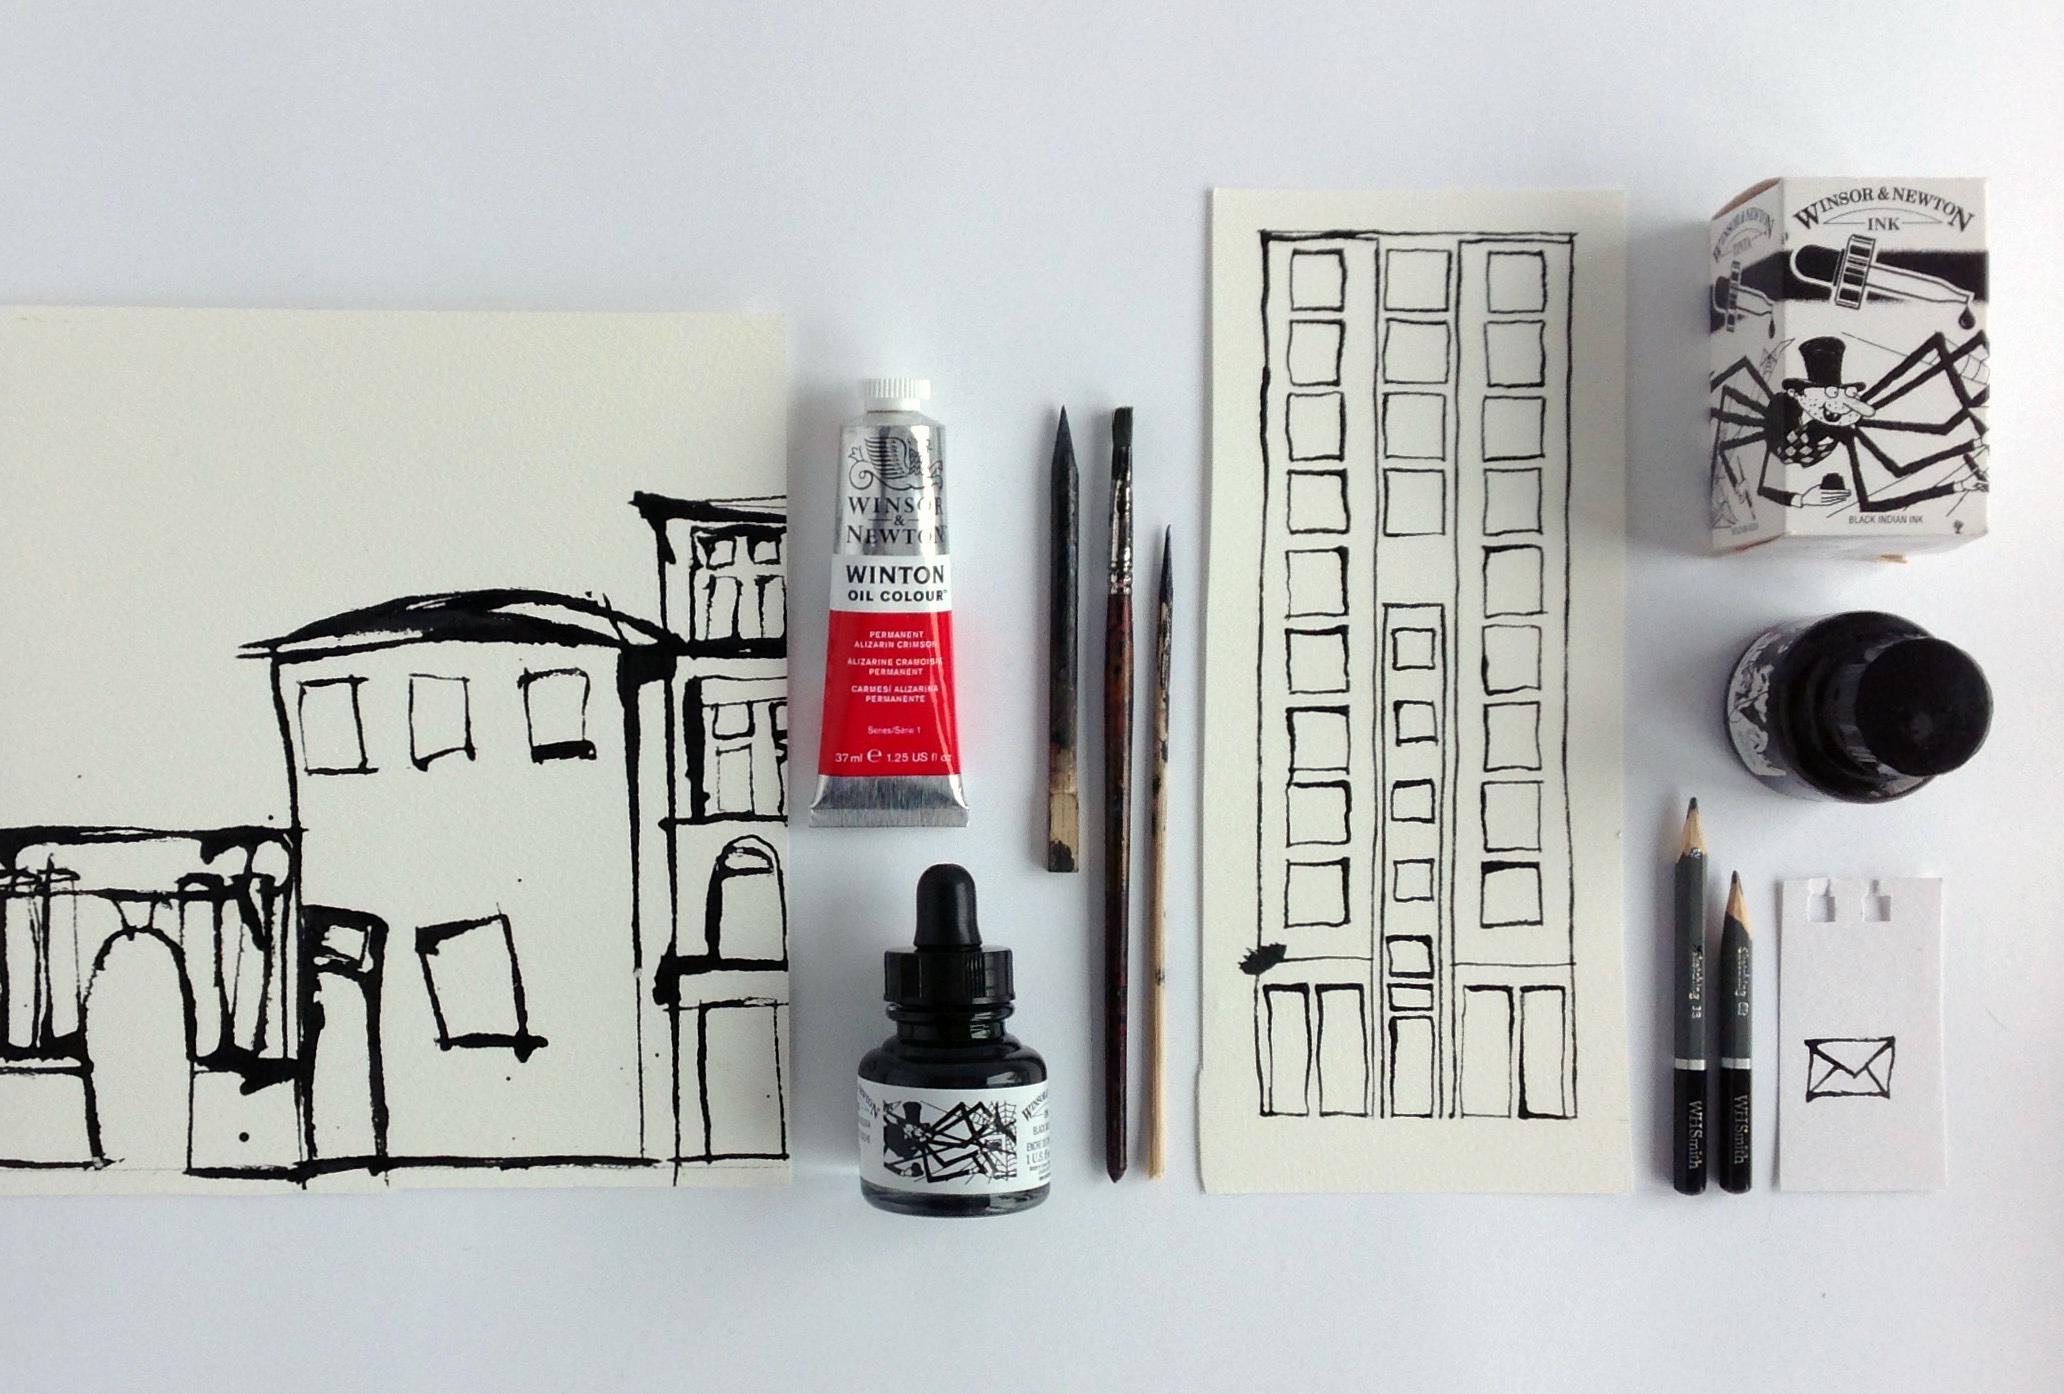 drawings-and-tools.jpg